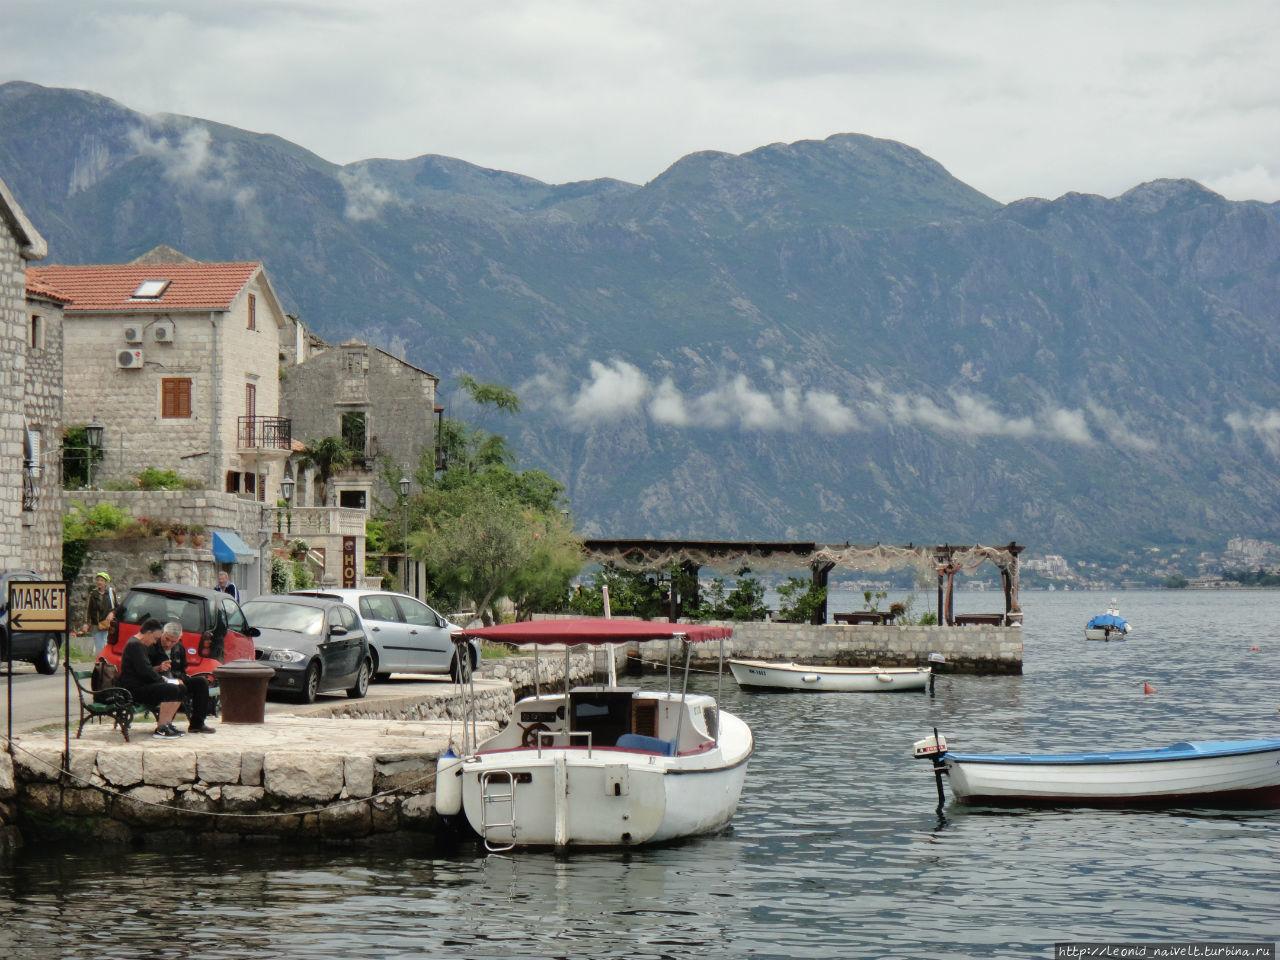 Пераст. Черногория. Одна улица, два острова, три бюста Пераст, Черногория